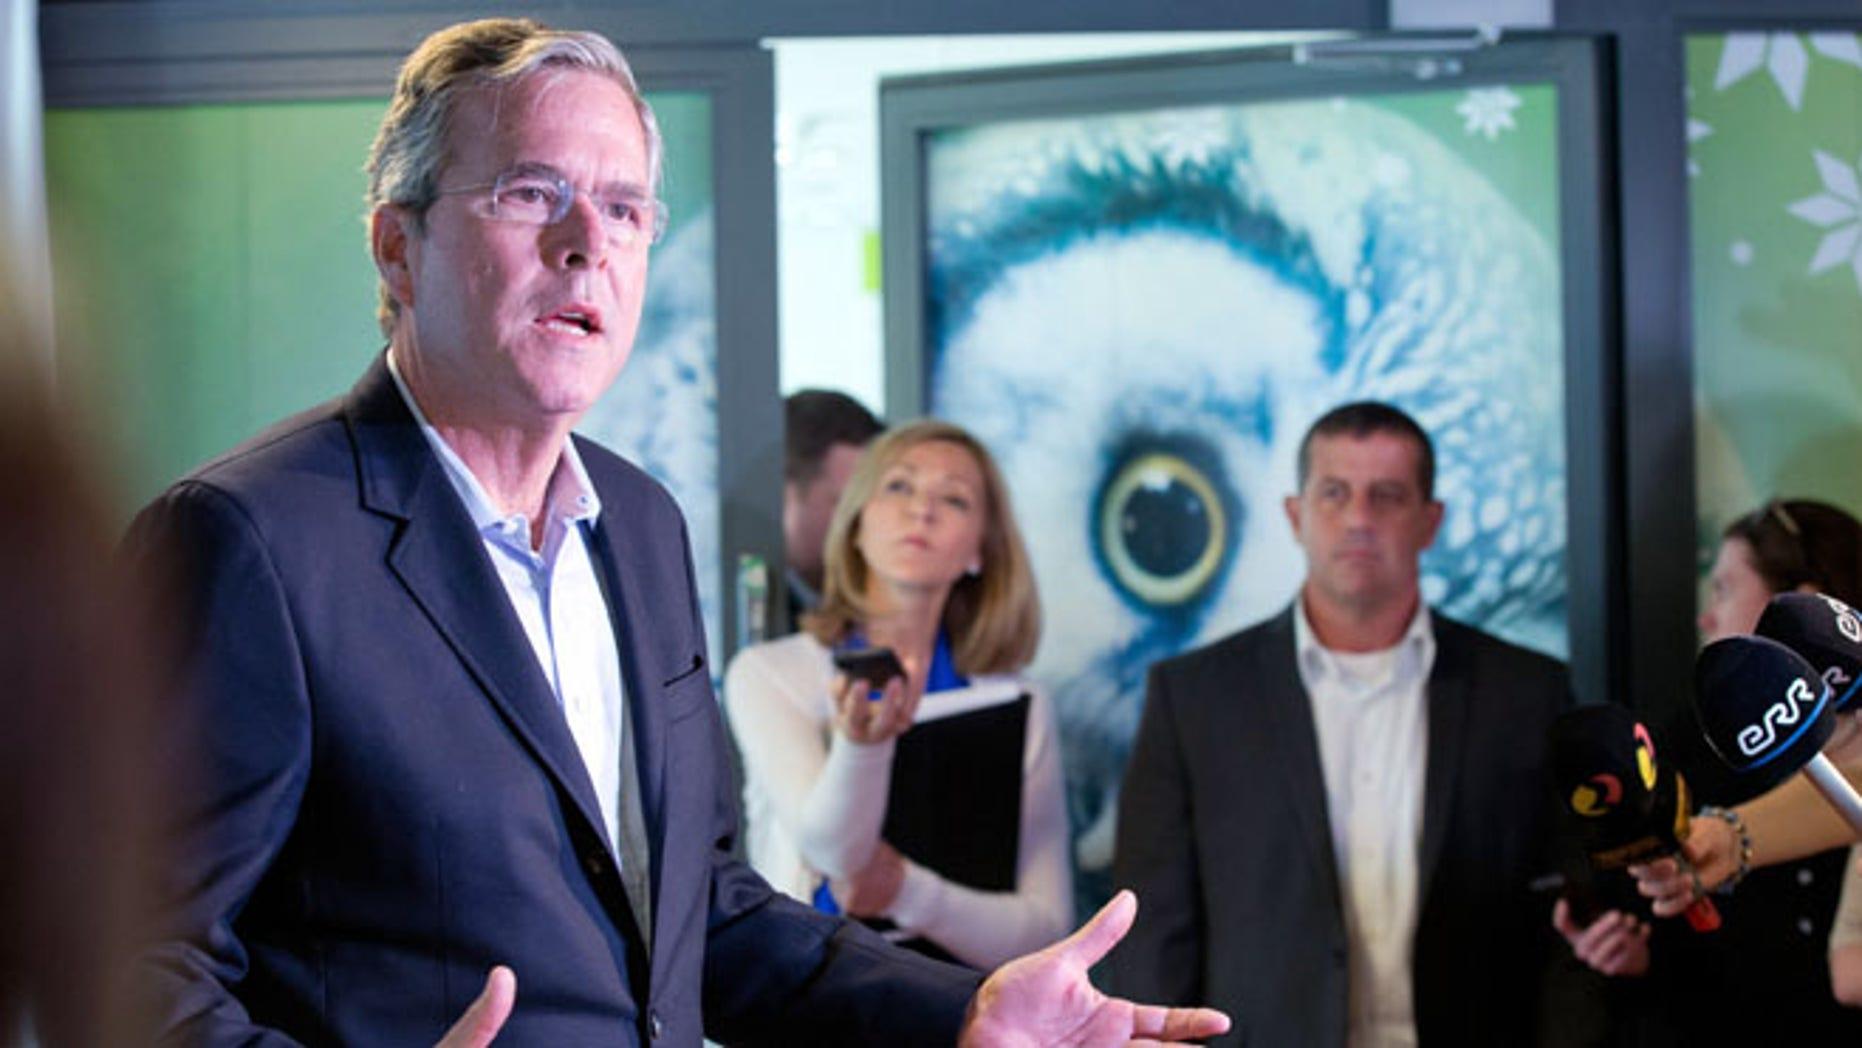 June 13, 2015: 2016 GOP presidential candidate Jeb Bush at the e- Estonia Showroom during his visit in Tallinn, Estonia.